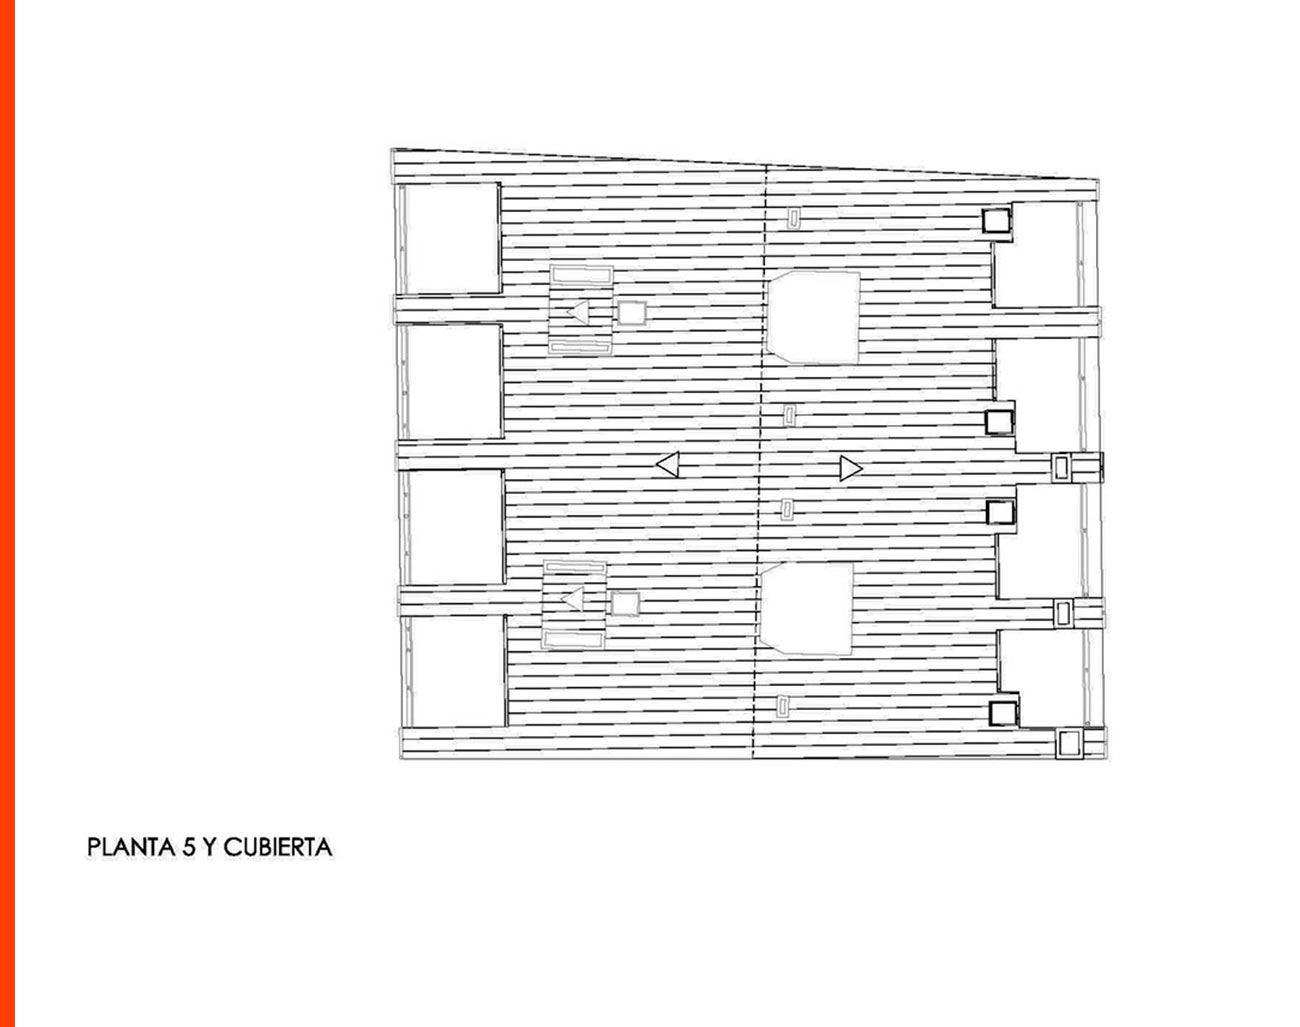 16 Viviendas en calle La Torre (León) para Merino Presa